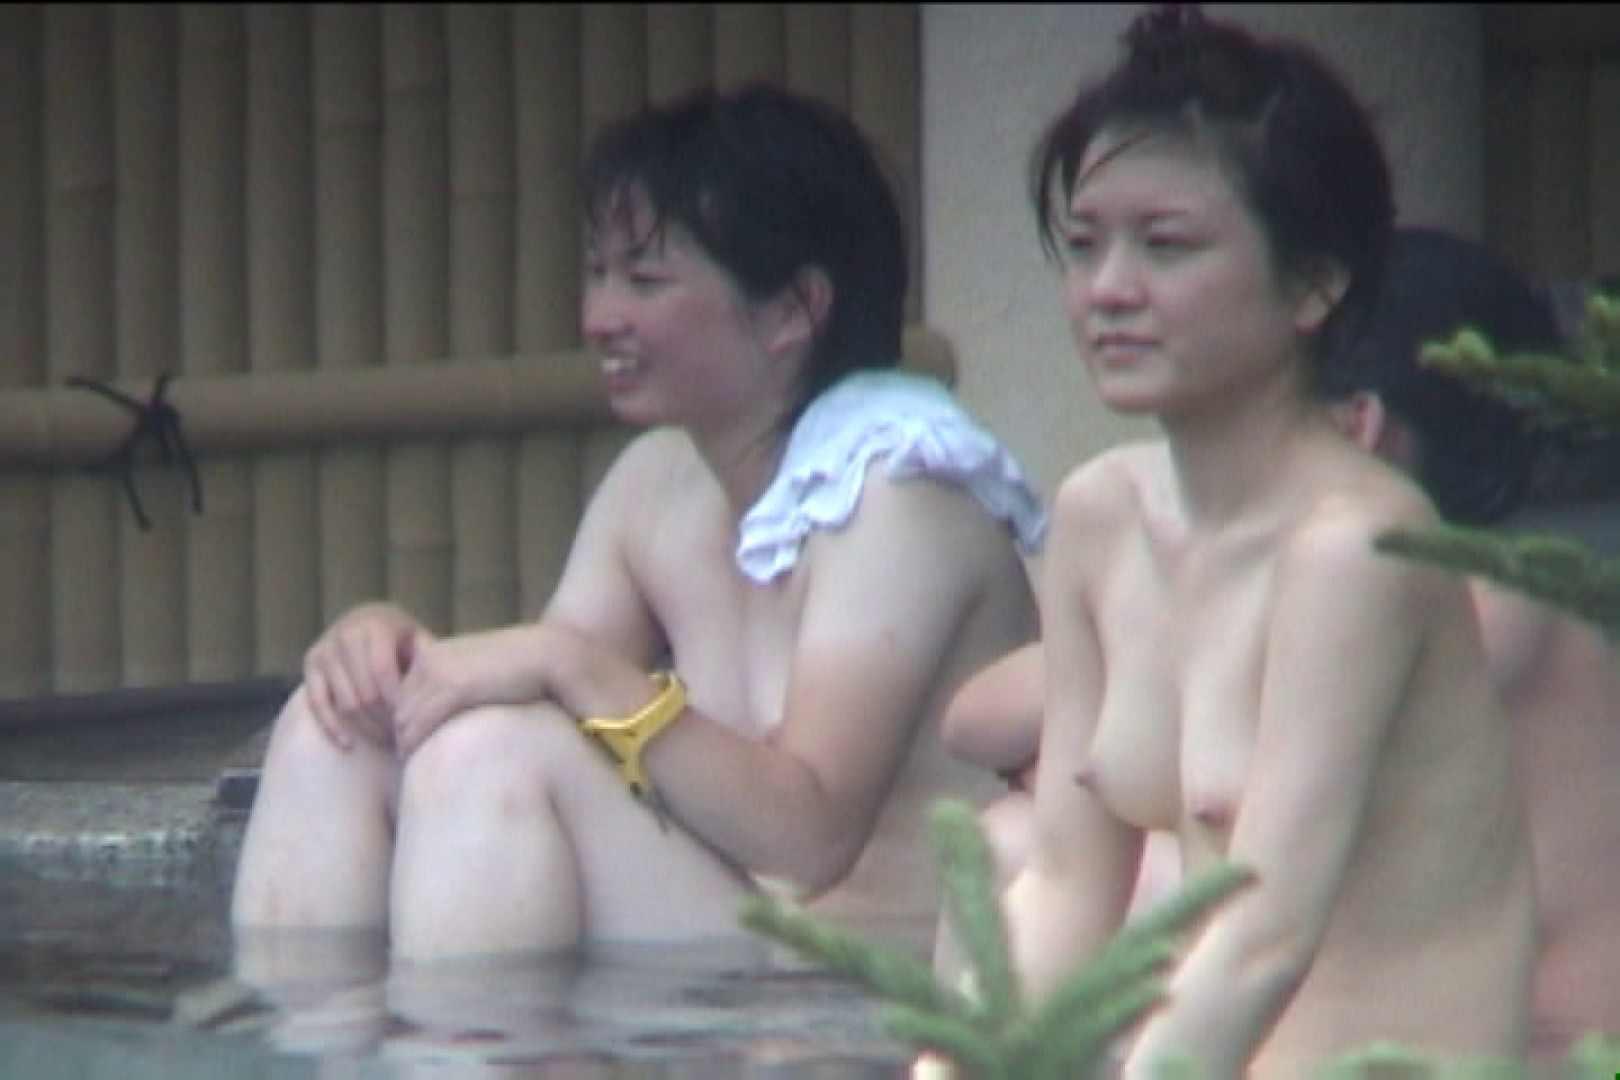 Aquaな露天風呂Vol.94【VIP限定】 0  52連発 4